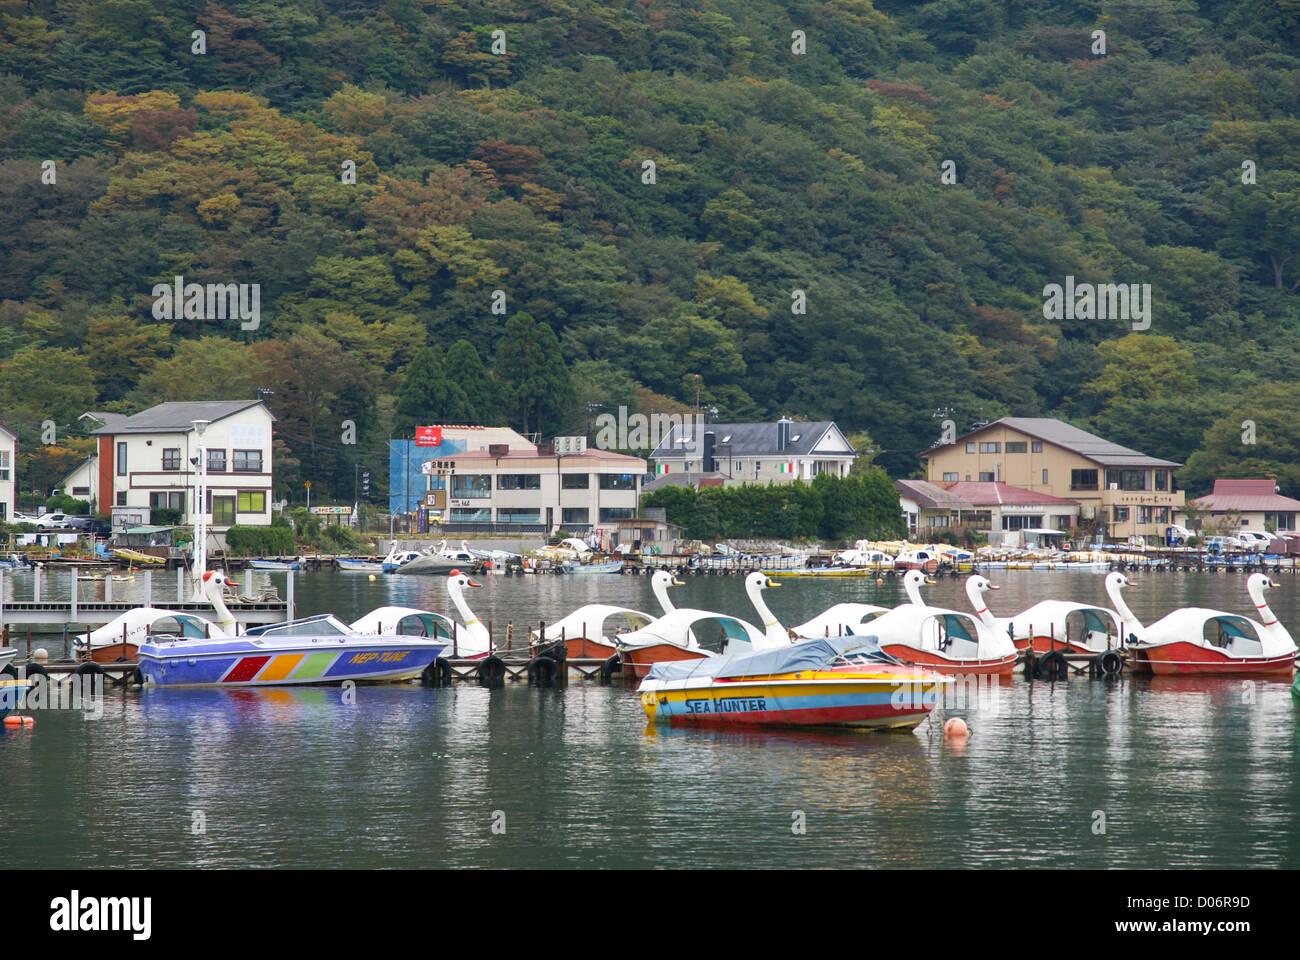 Japan, Honshu Island, Kanagawa Prefecture, Fuji Hakone National Park, Lake Ashi - Stock Image